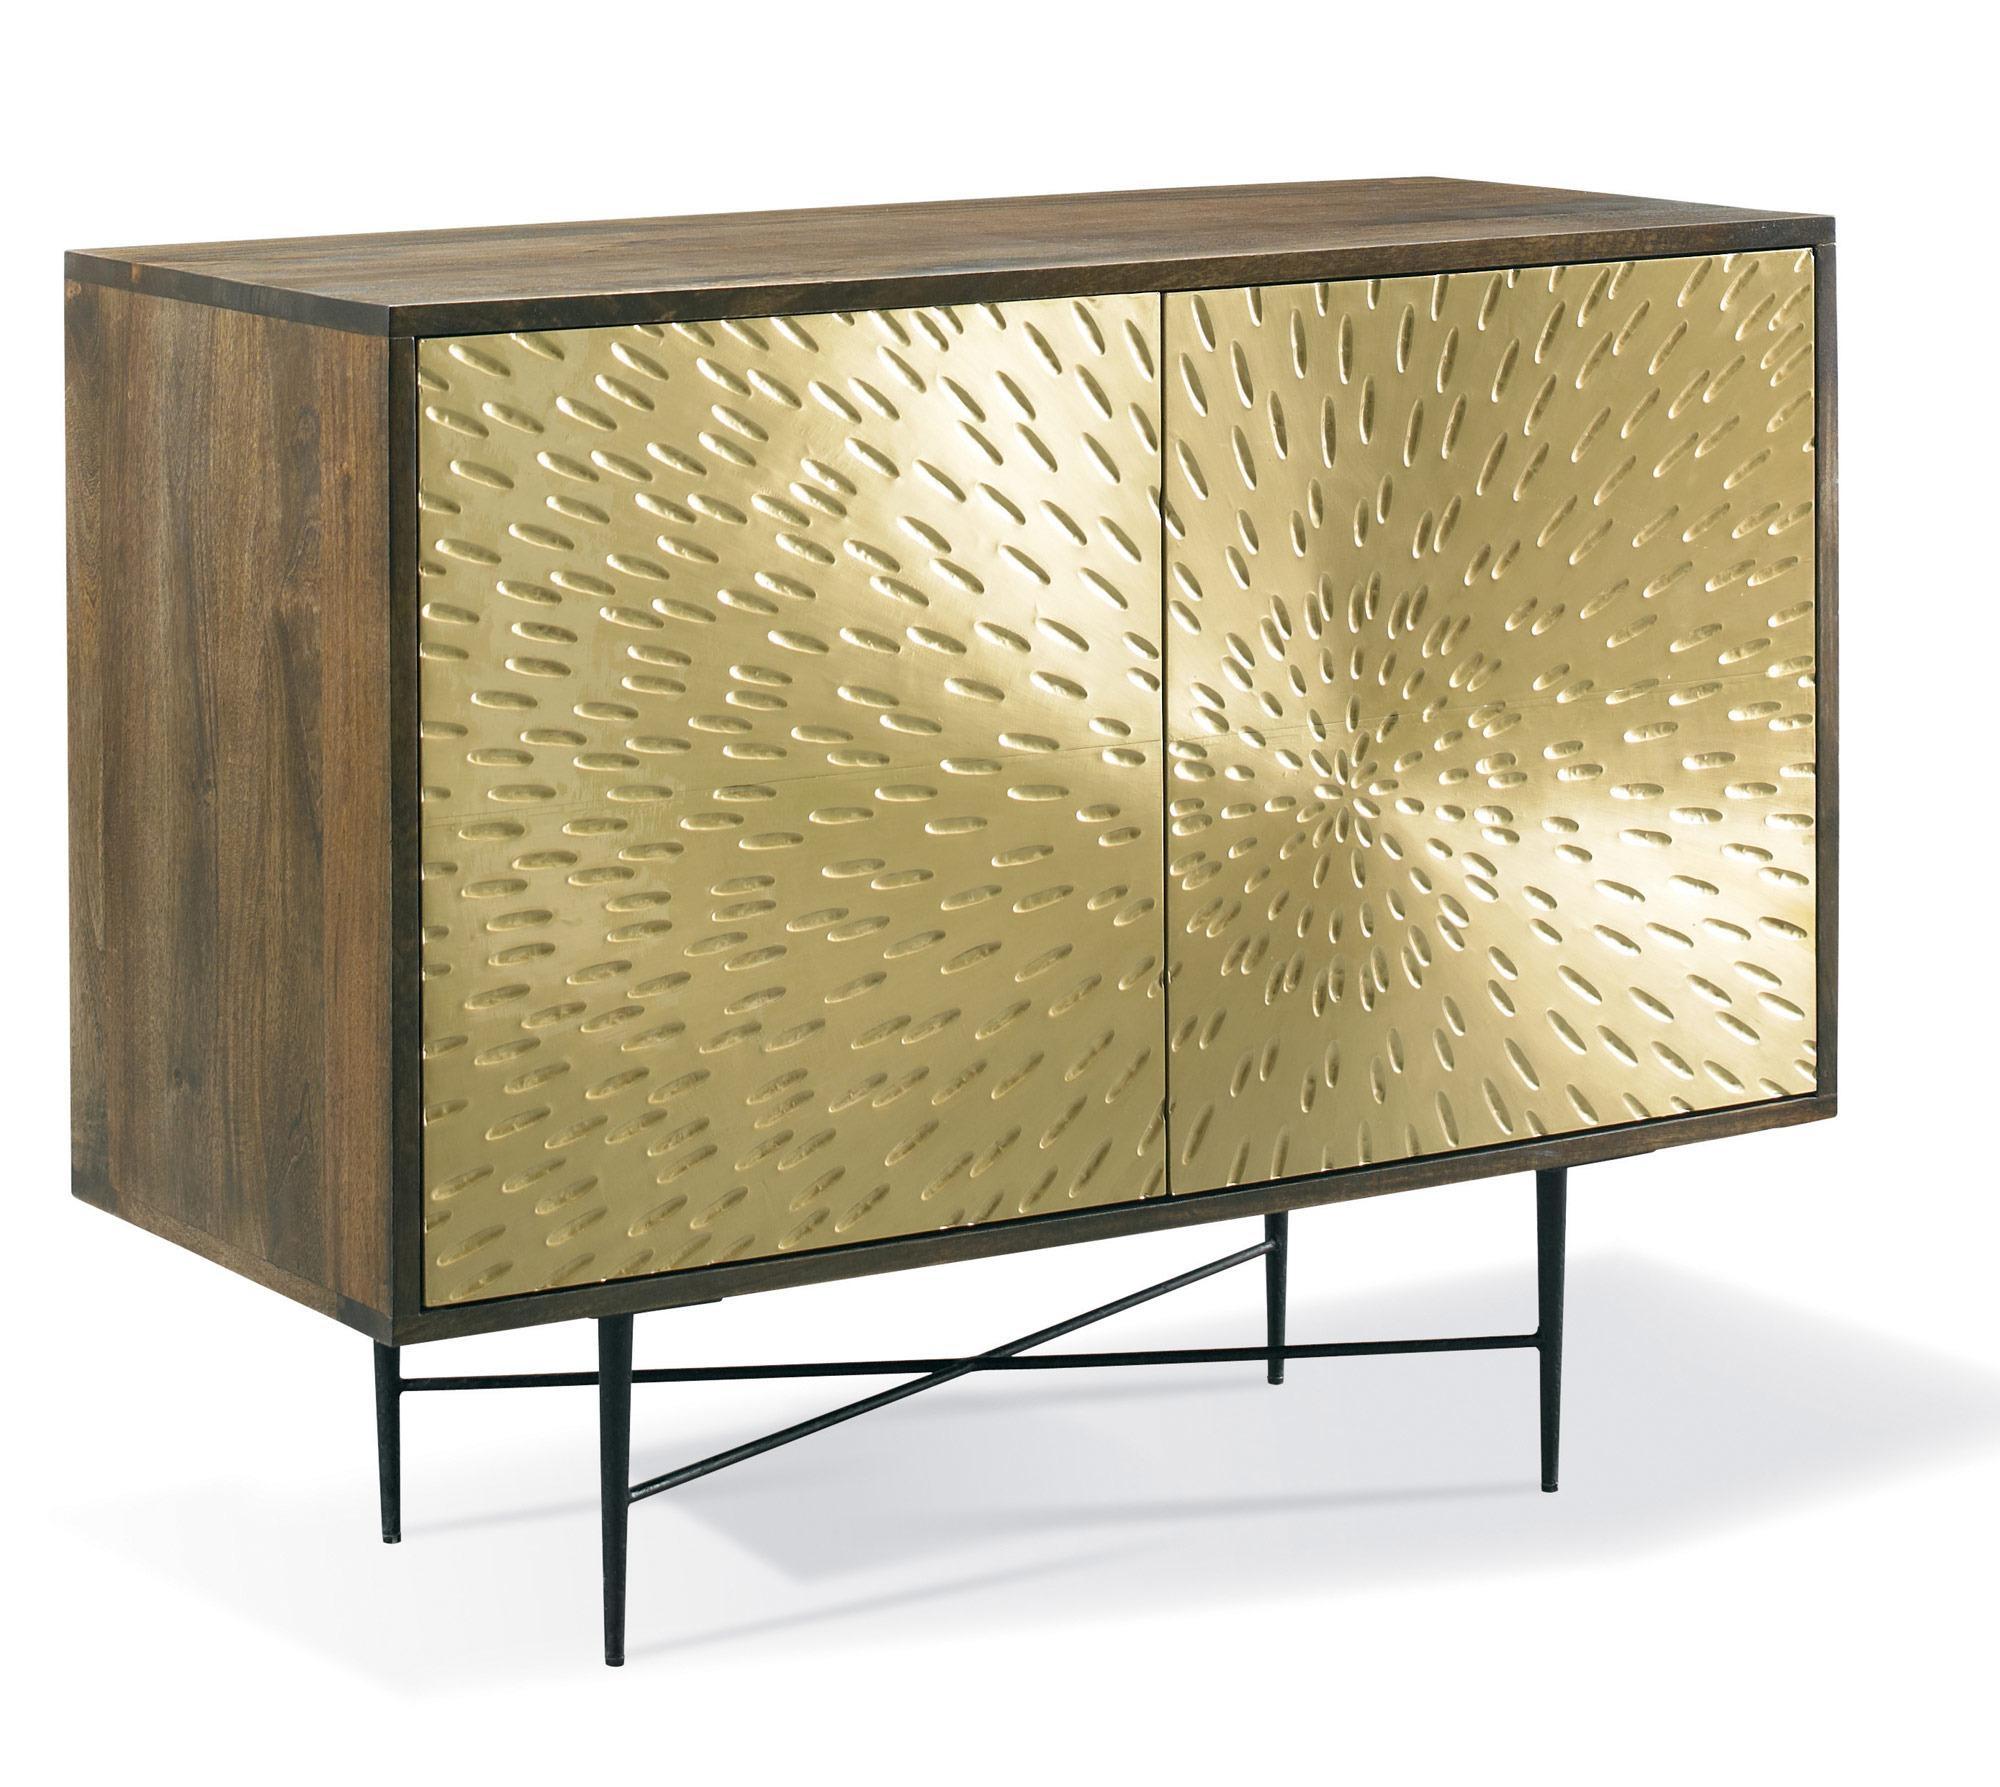 Furniture & Sofa: Classic Furniture Designcth Sherrill Inside Sherrill Sectional (Image 4 of 20)